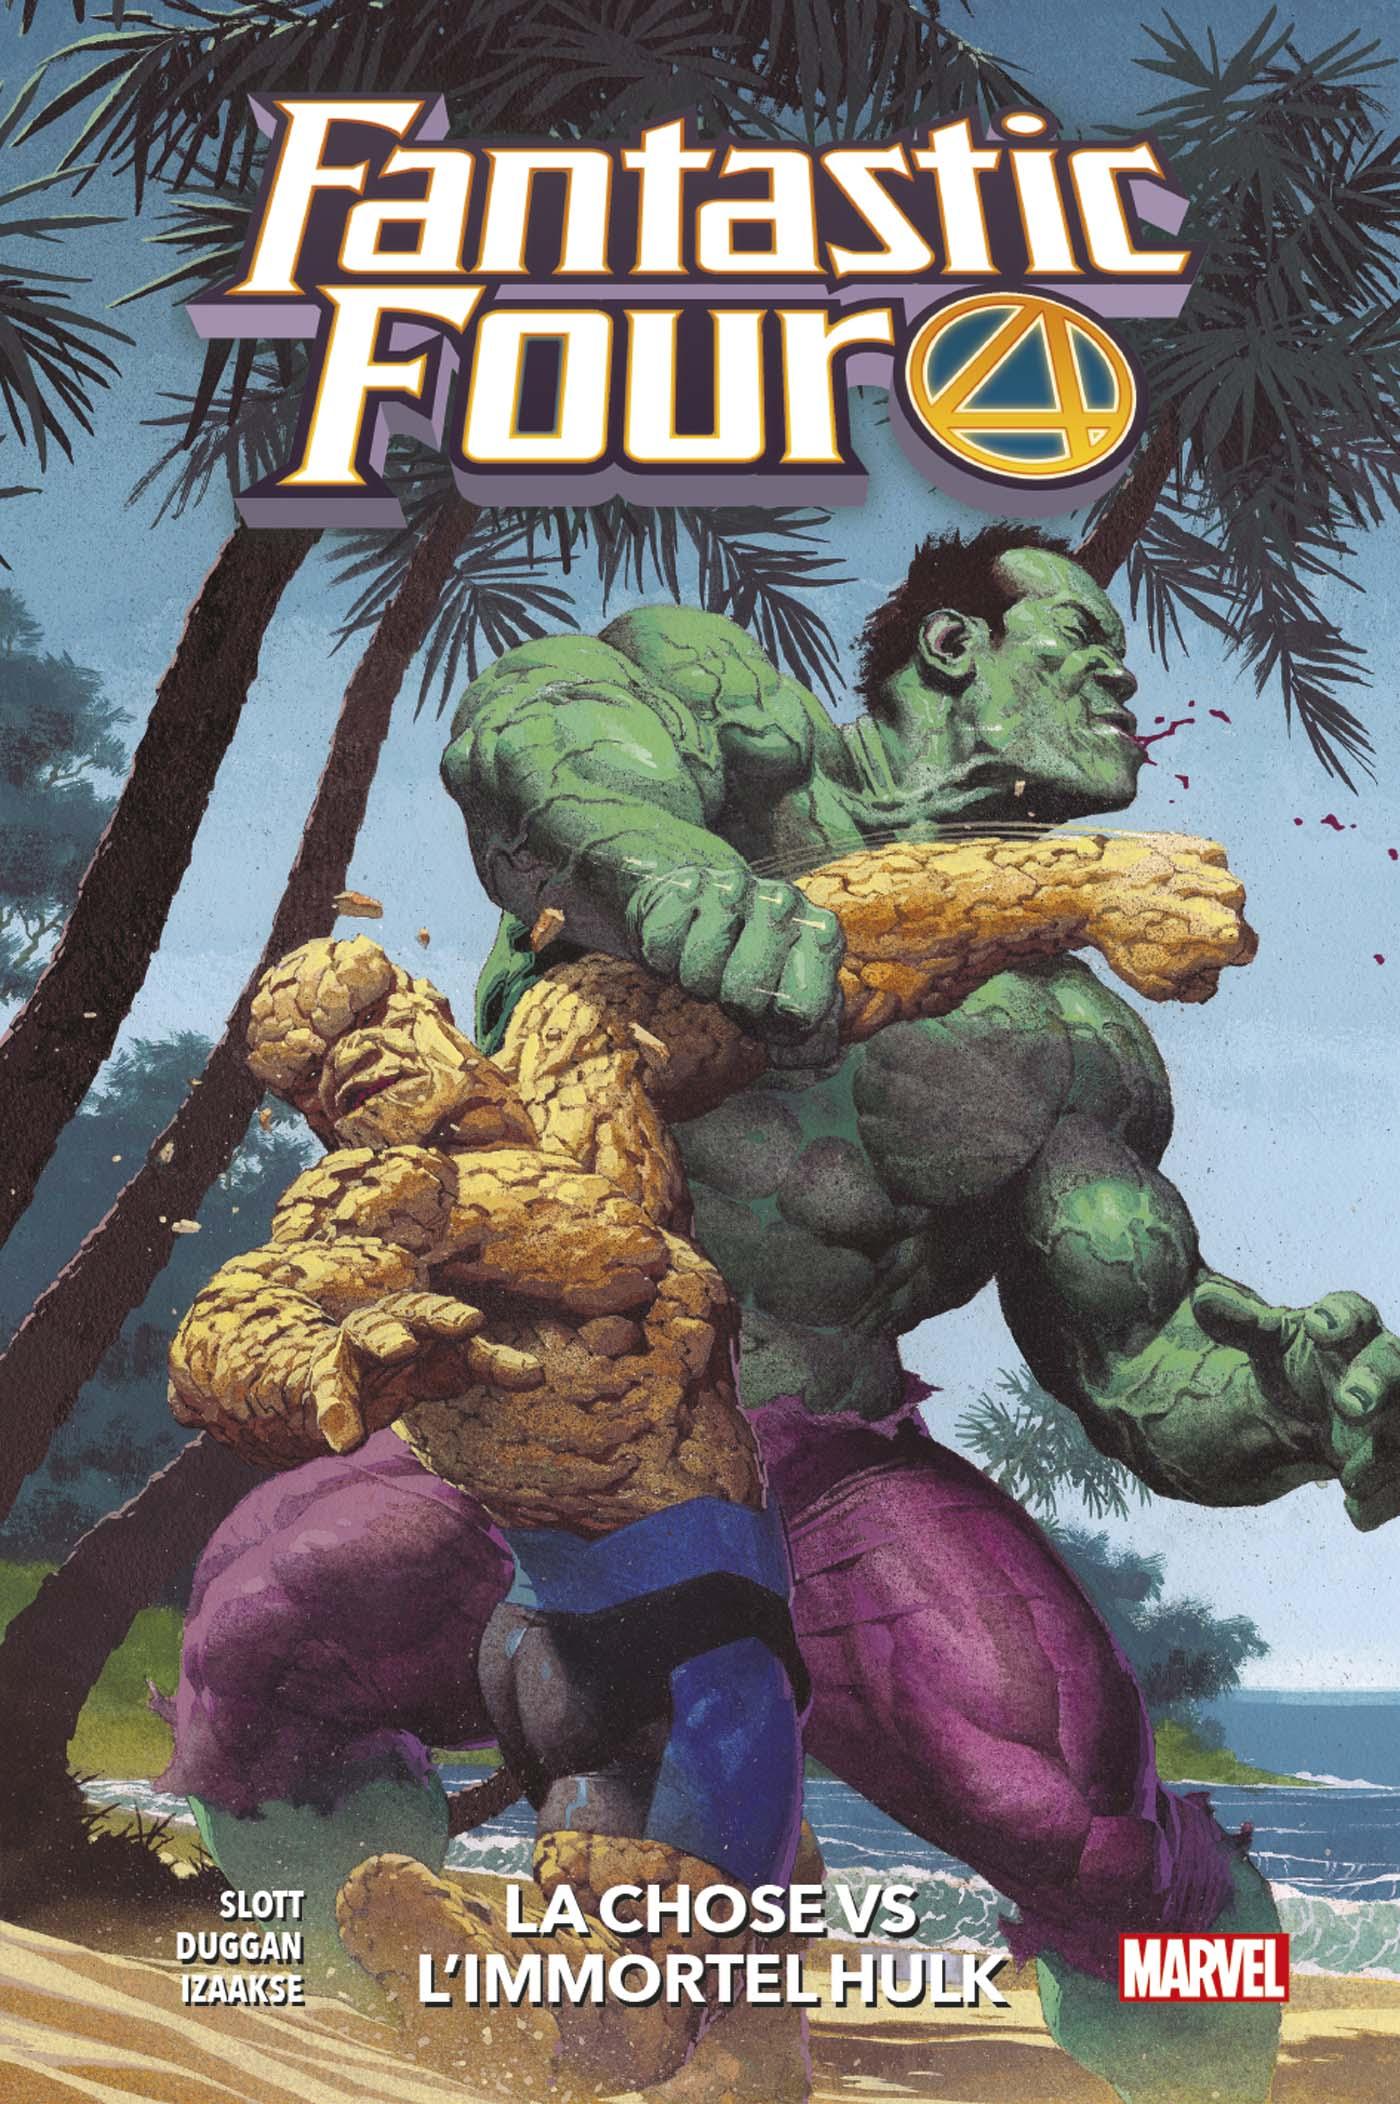 Fantastic Four 4 - La Chose Vs L'immortel Hulk